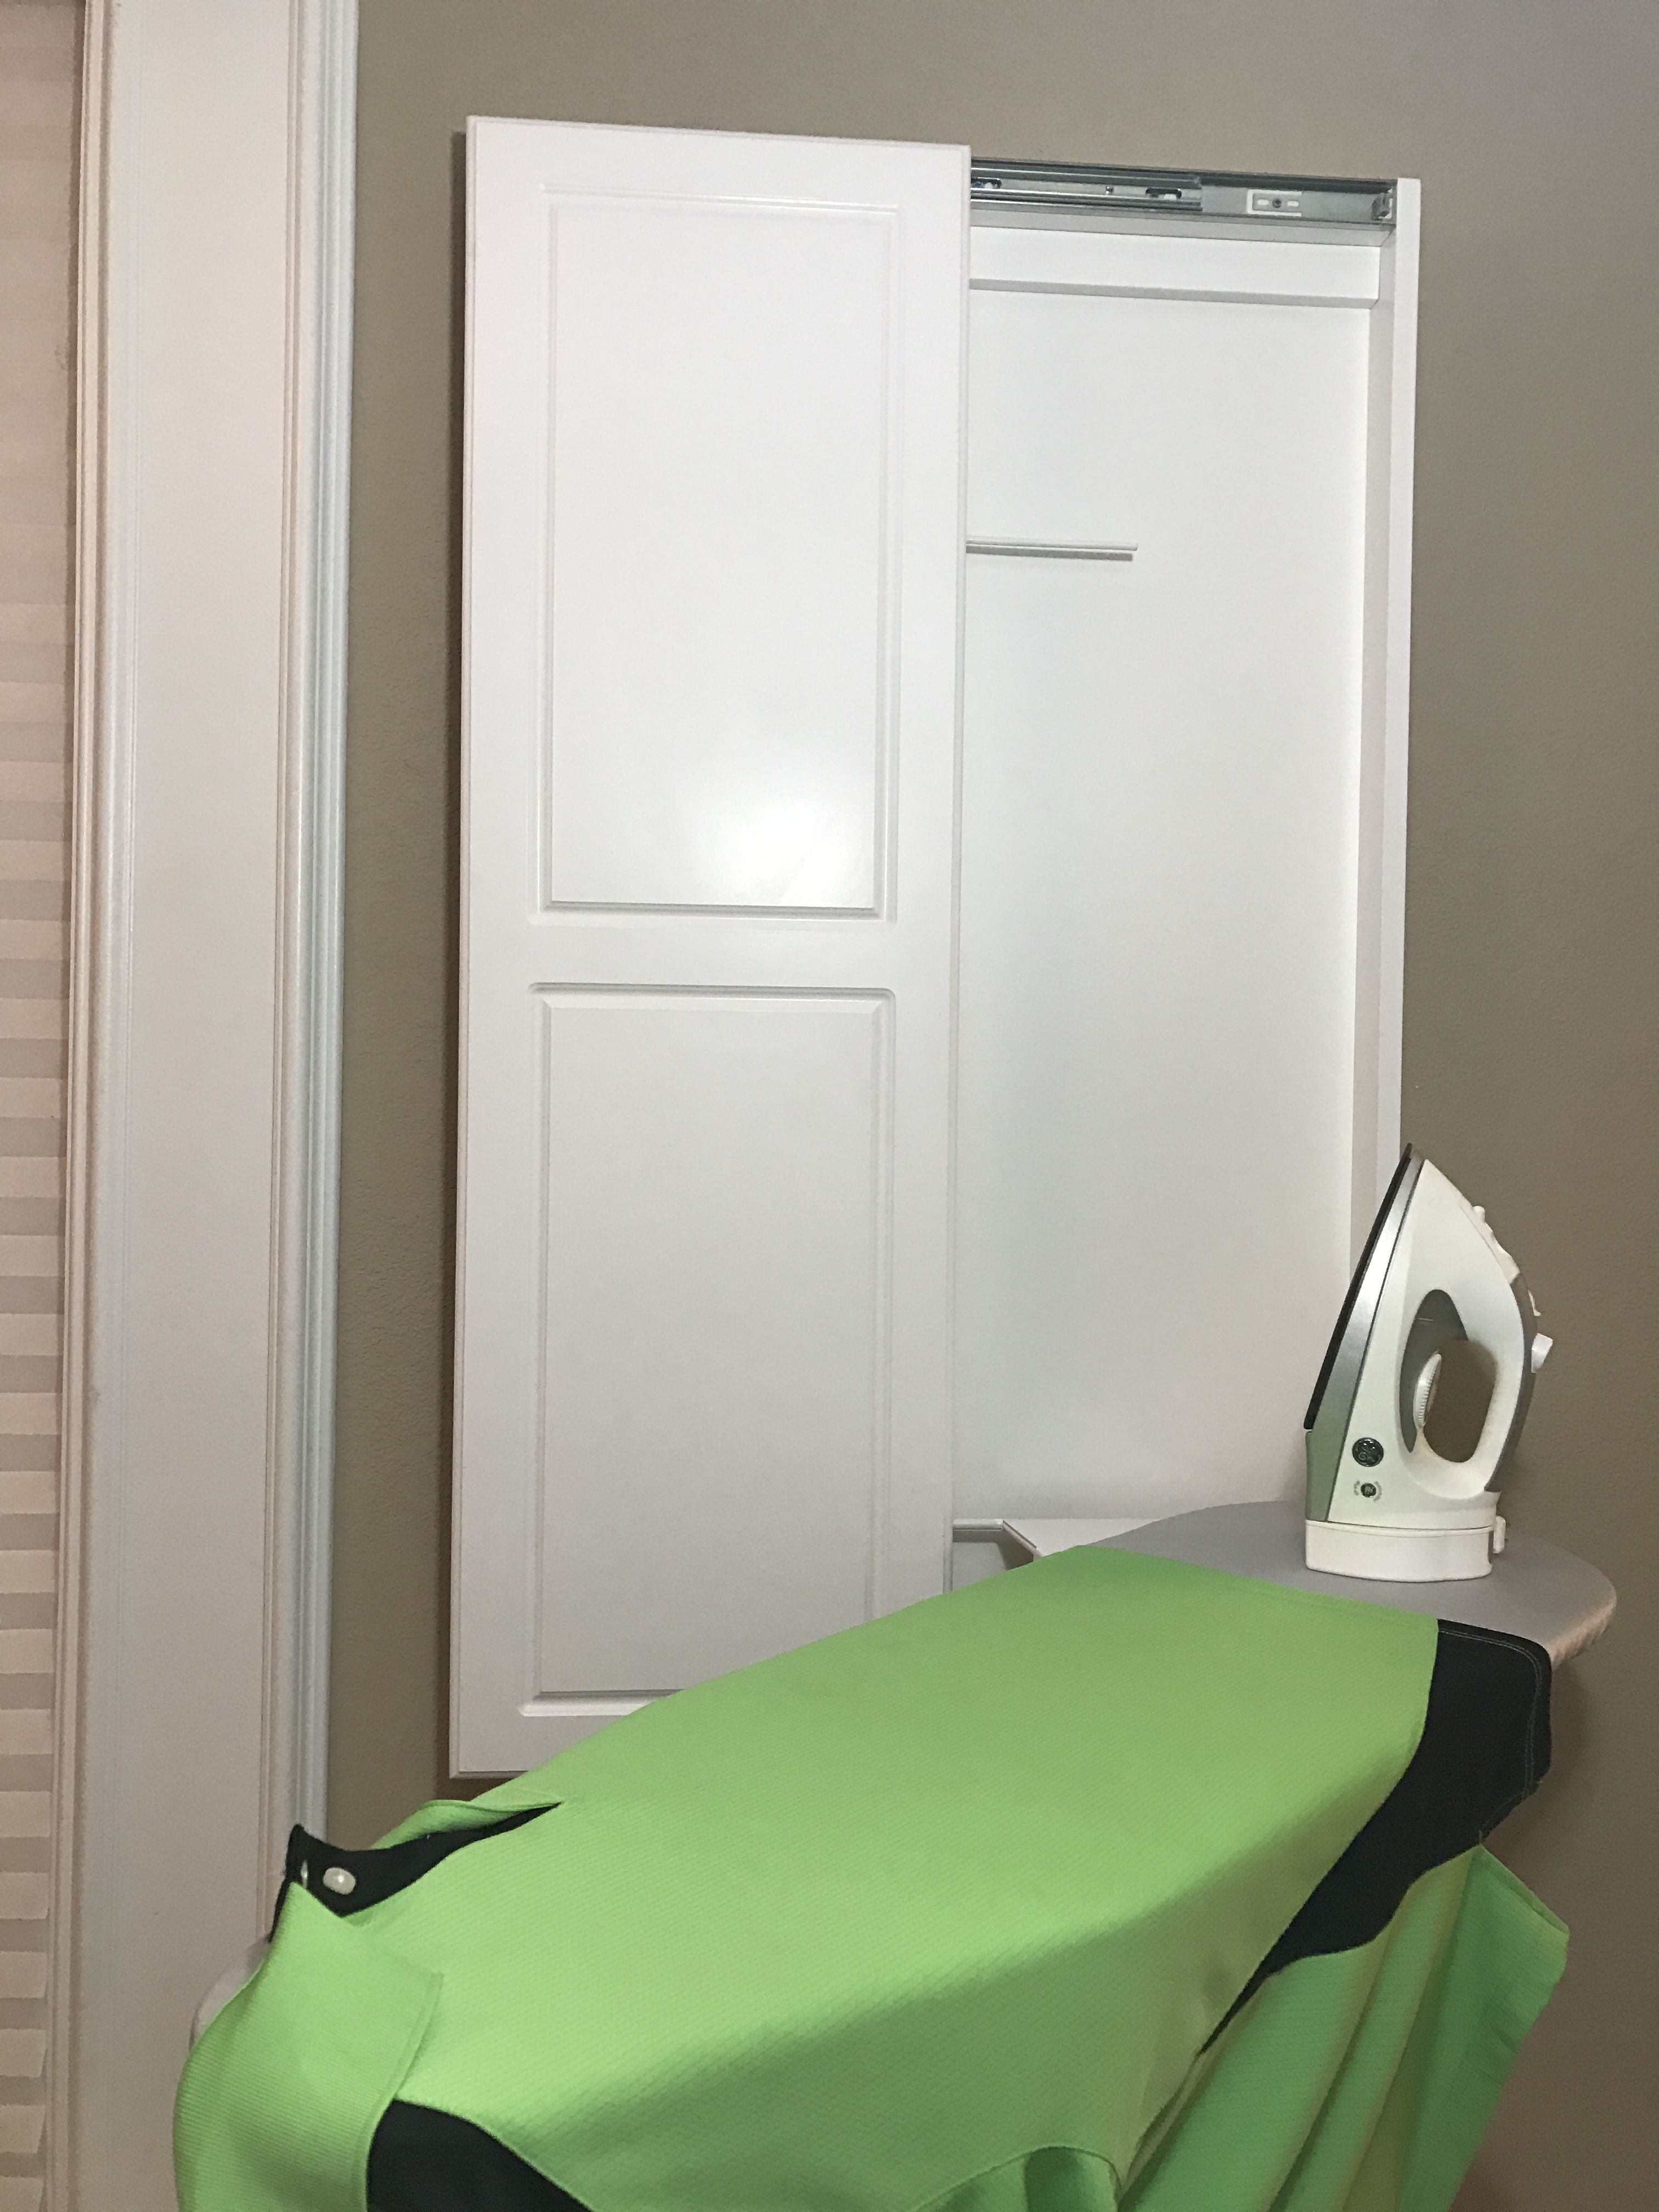 Wall Mounted Ironing Board Slideaway Ironing Boards Wall